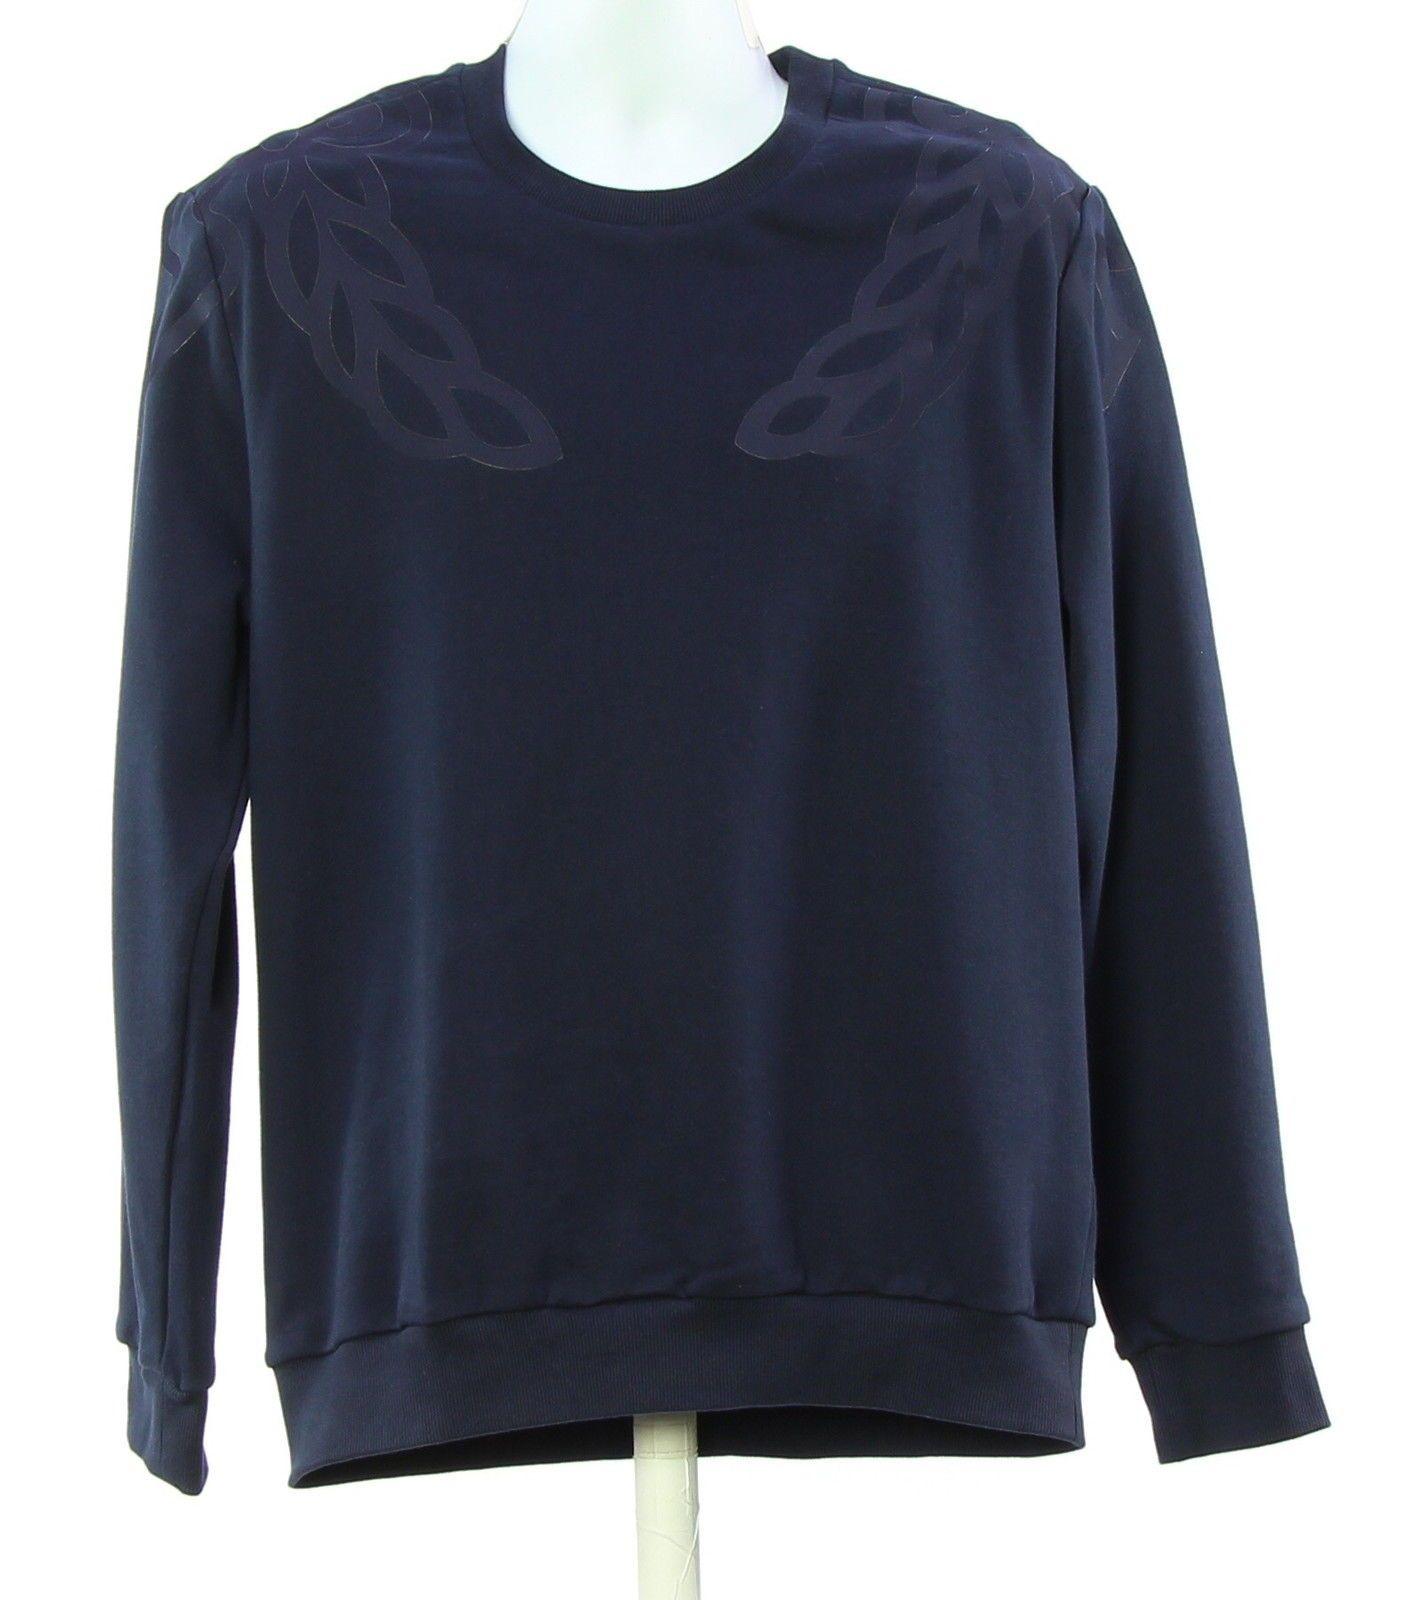 Womens MCM Navy Blue 100% Cotton Crewneck Sweater Size Large ...